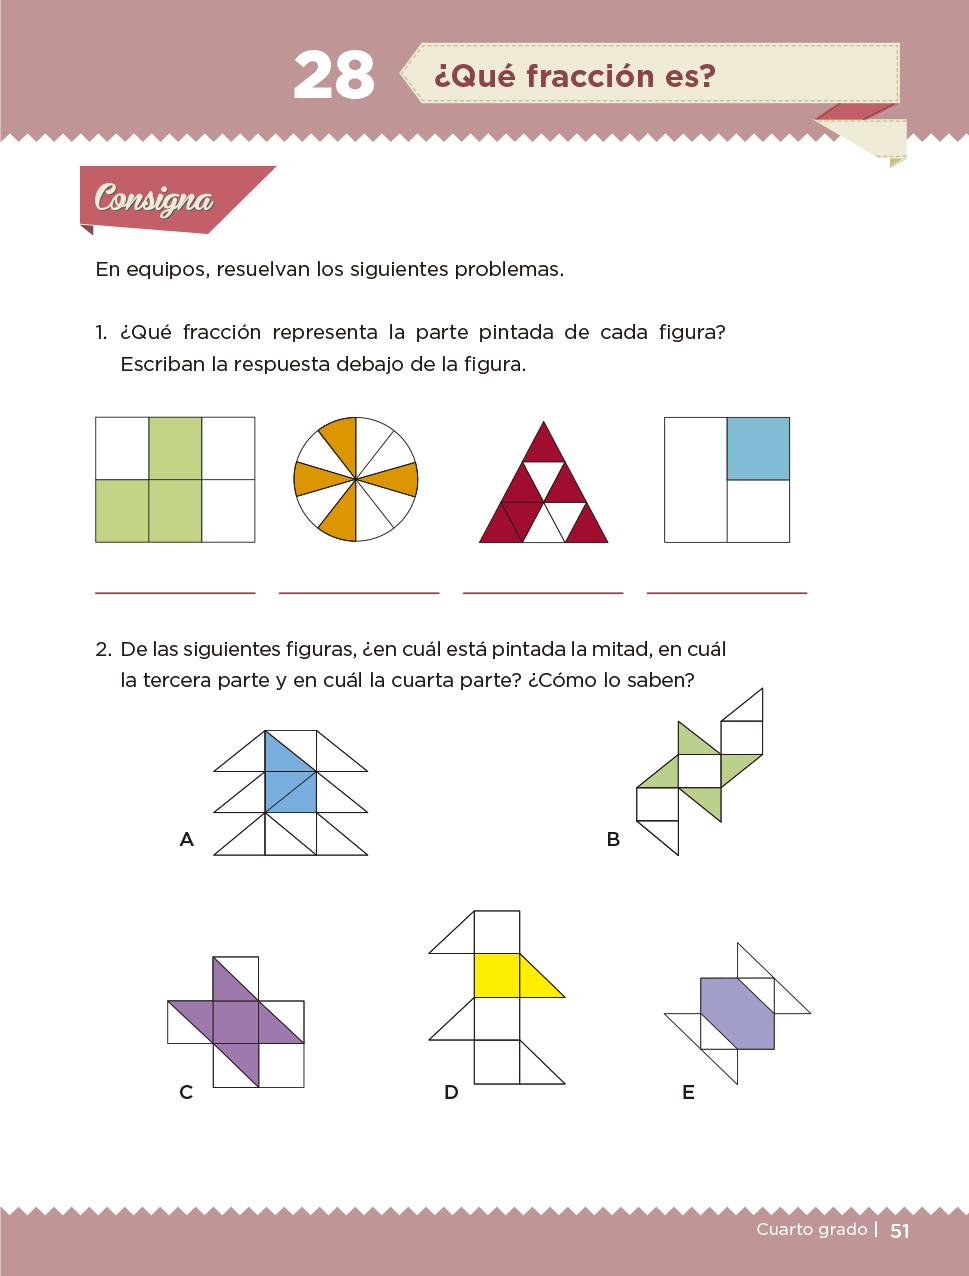 Desafios Matematicos 4 Grado Pdf : desafios, matematicos, grado, Desafíos, Matemáticos, Cuarto, Grado, 2017-2018, Ciclo, Escolar, Centro, Descargas